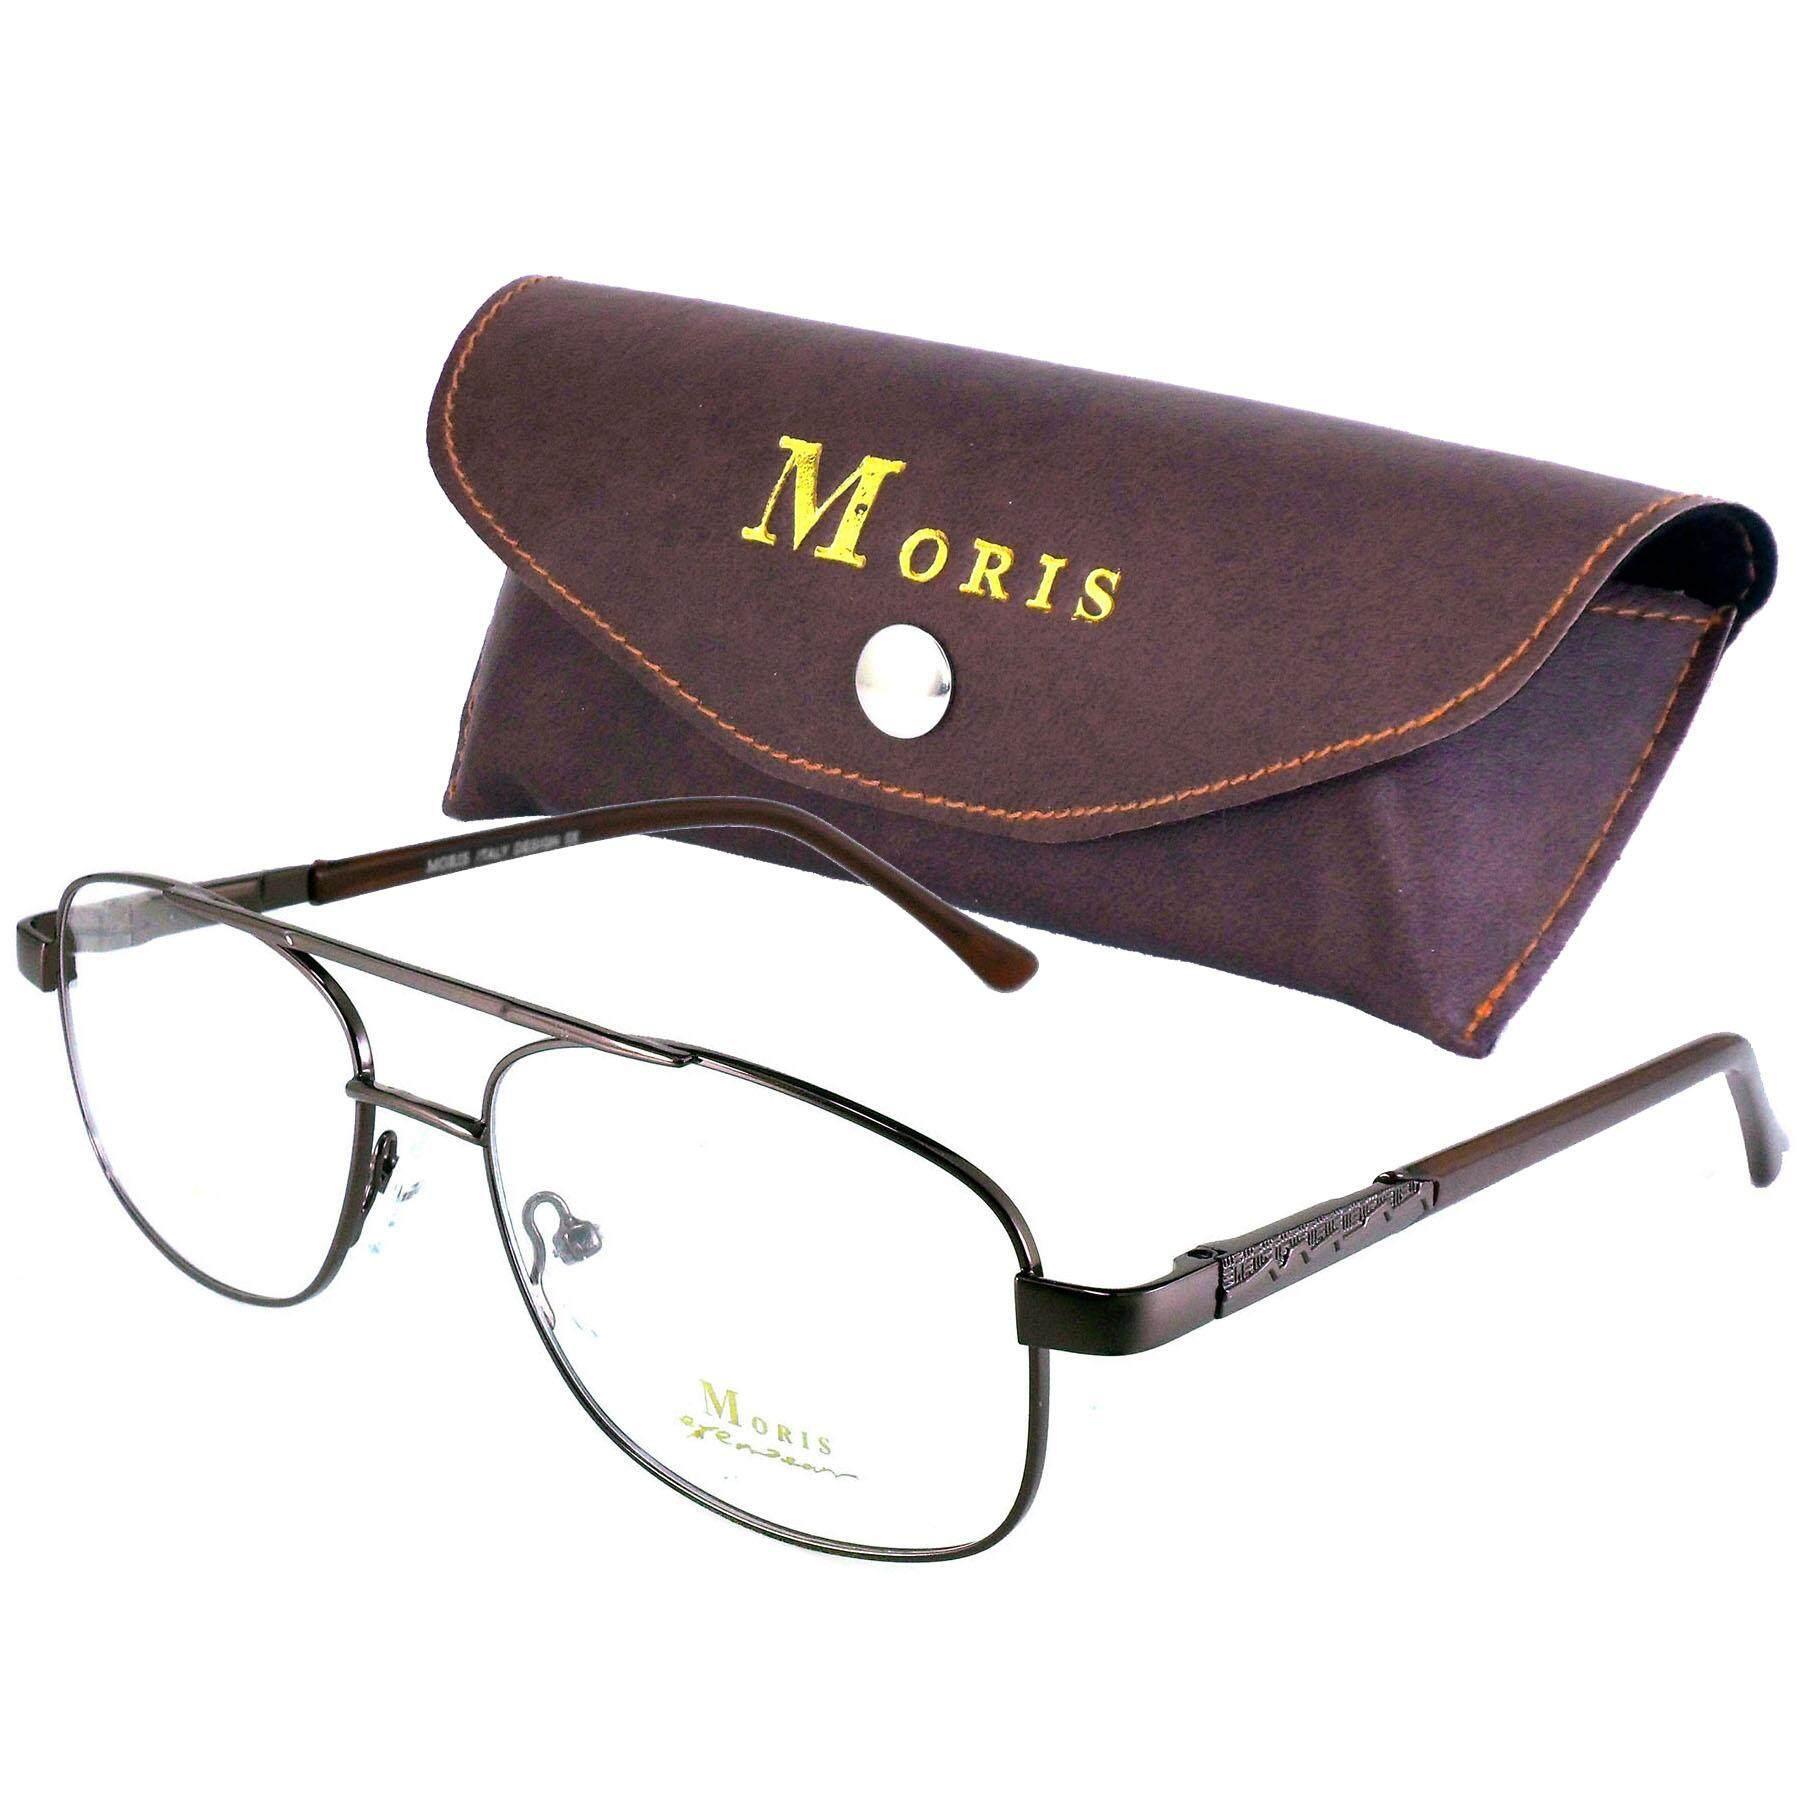 Moris แว่นตา รุ่น 2905 กรอบแว่นตา ( สำหรับตัดเลนส์ ) ทรงสปอร์ต วัสดุ สแตนเลสสตีล หรือเหล็กกล้าไร้สนิม Stainless Steel ขาสปริง กรอบแว่นตา Eyeweartop Glasses By Drone.